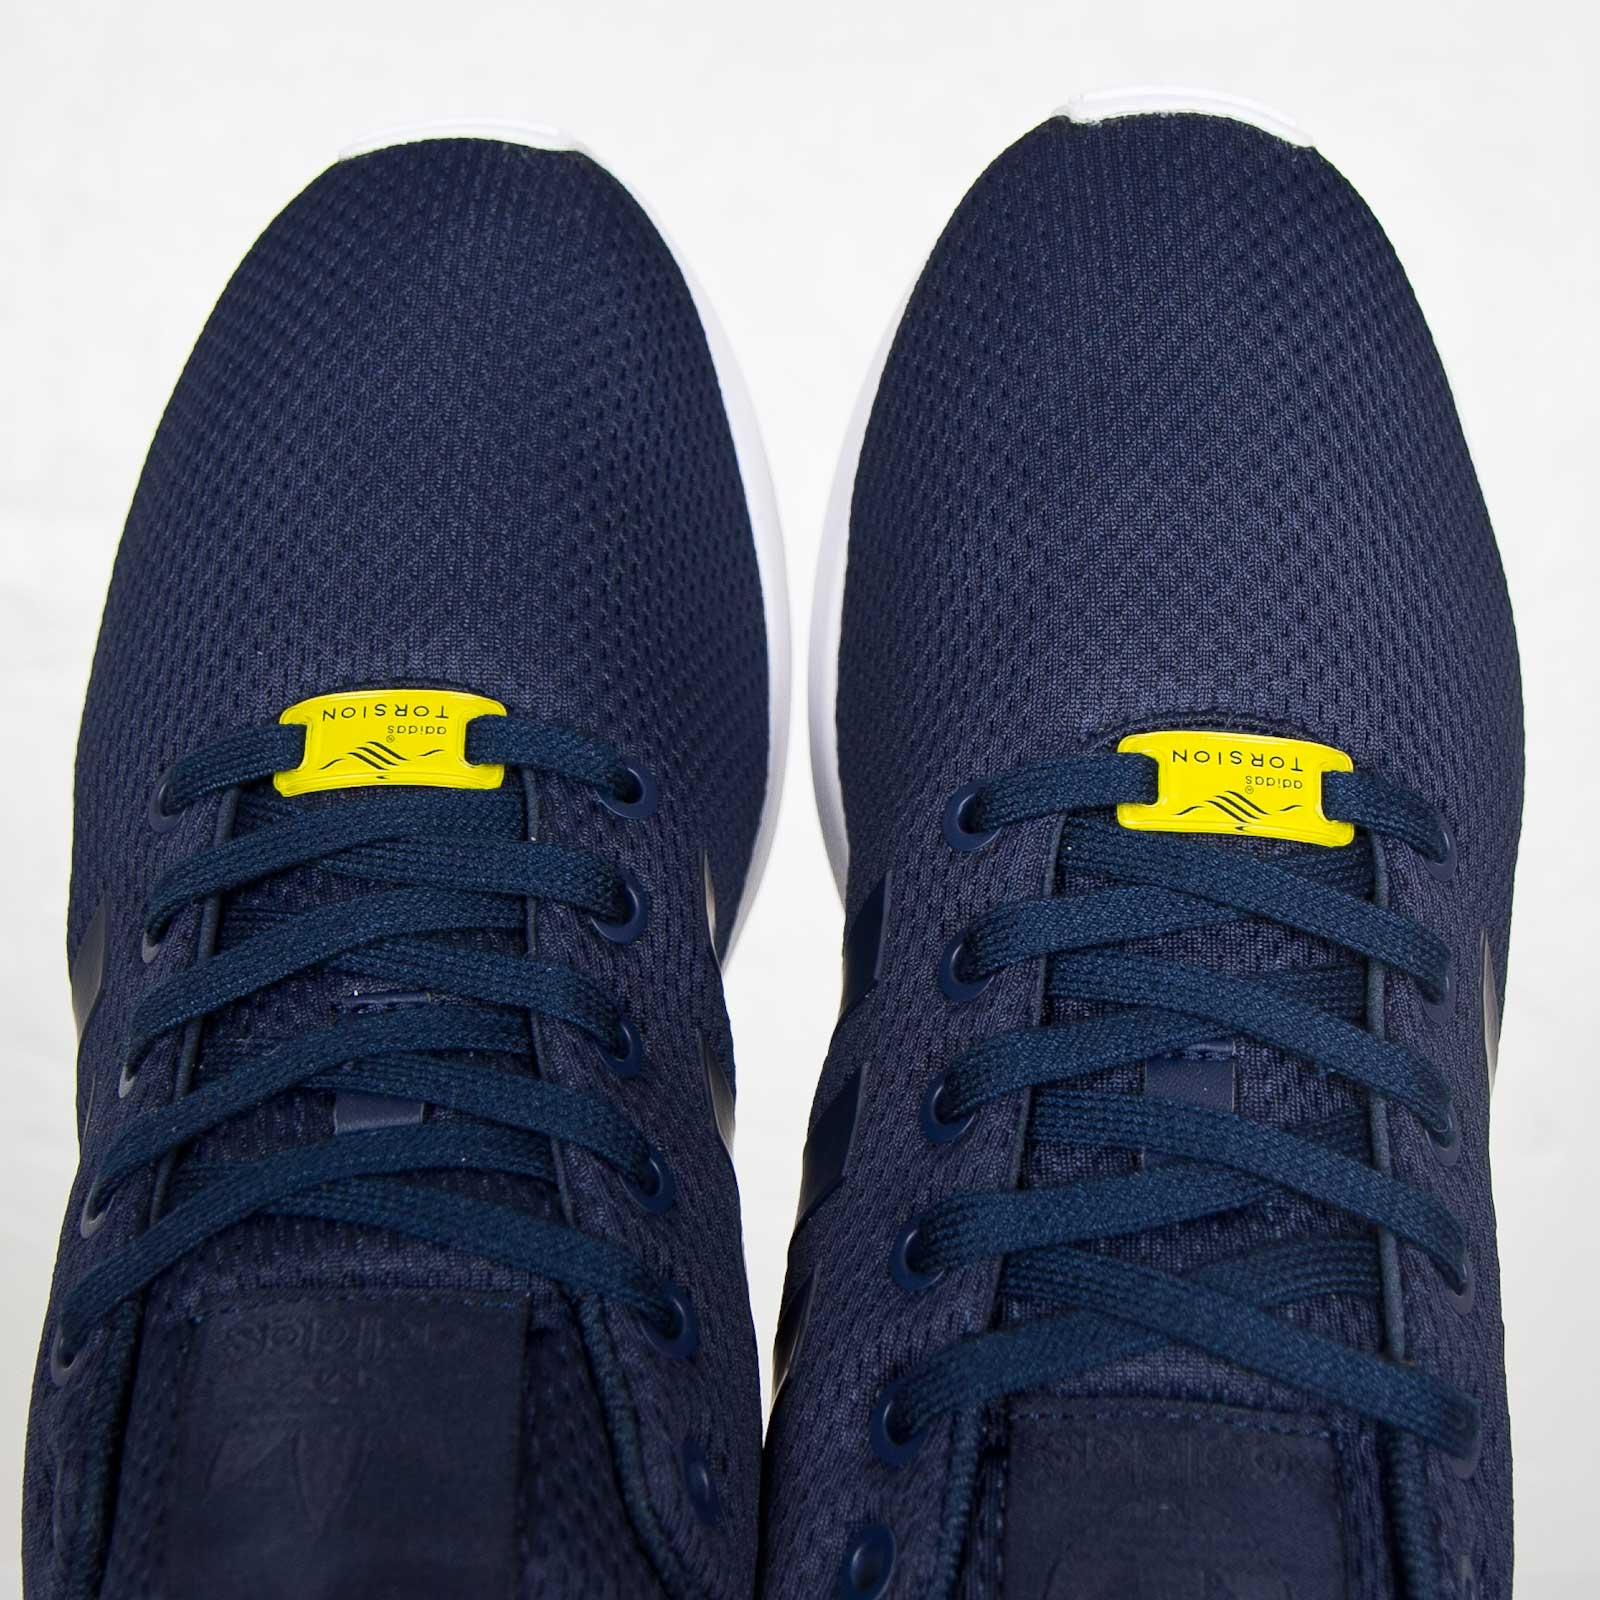 on sale 2deb2 e0c53 adidas ZX Flux - 7. Close